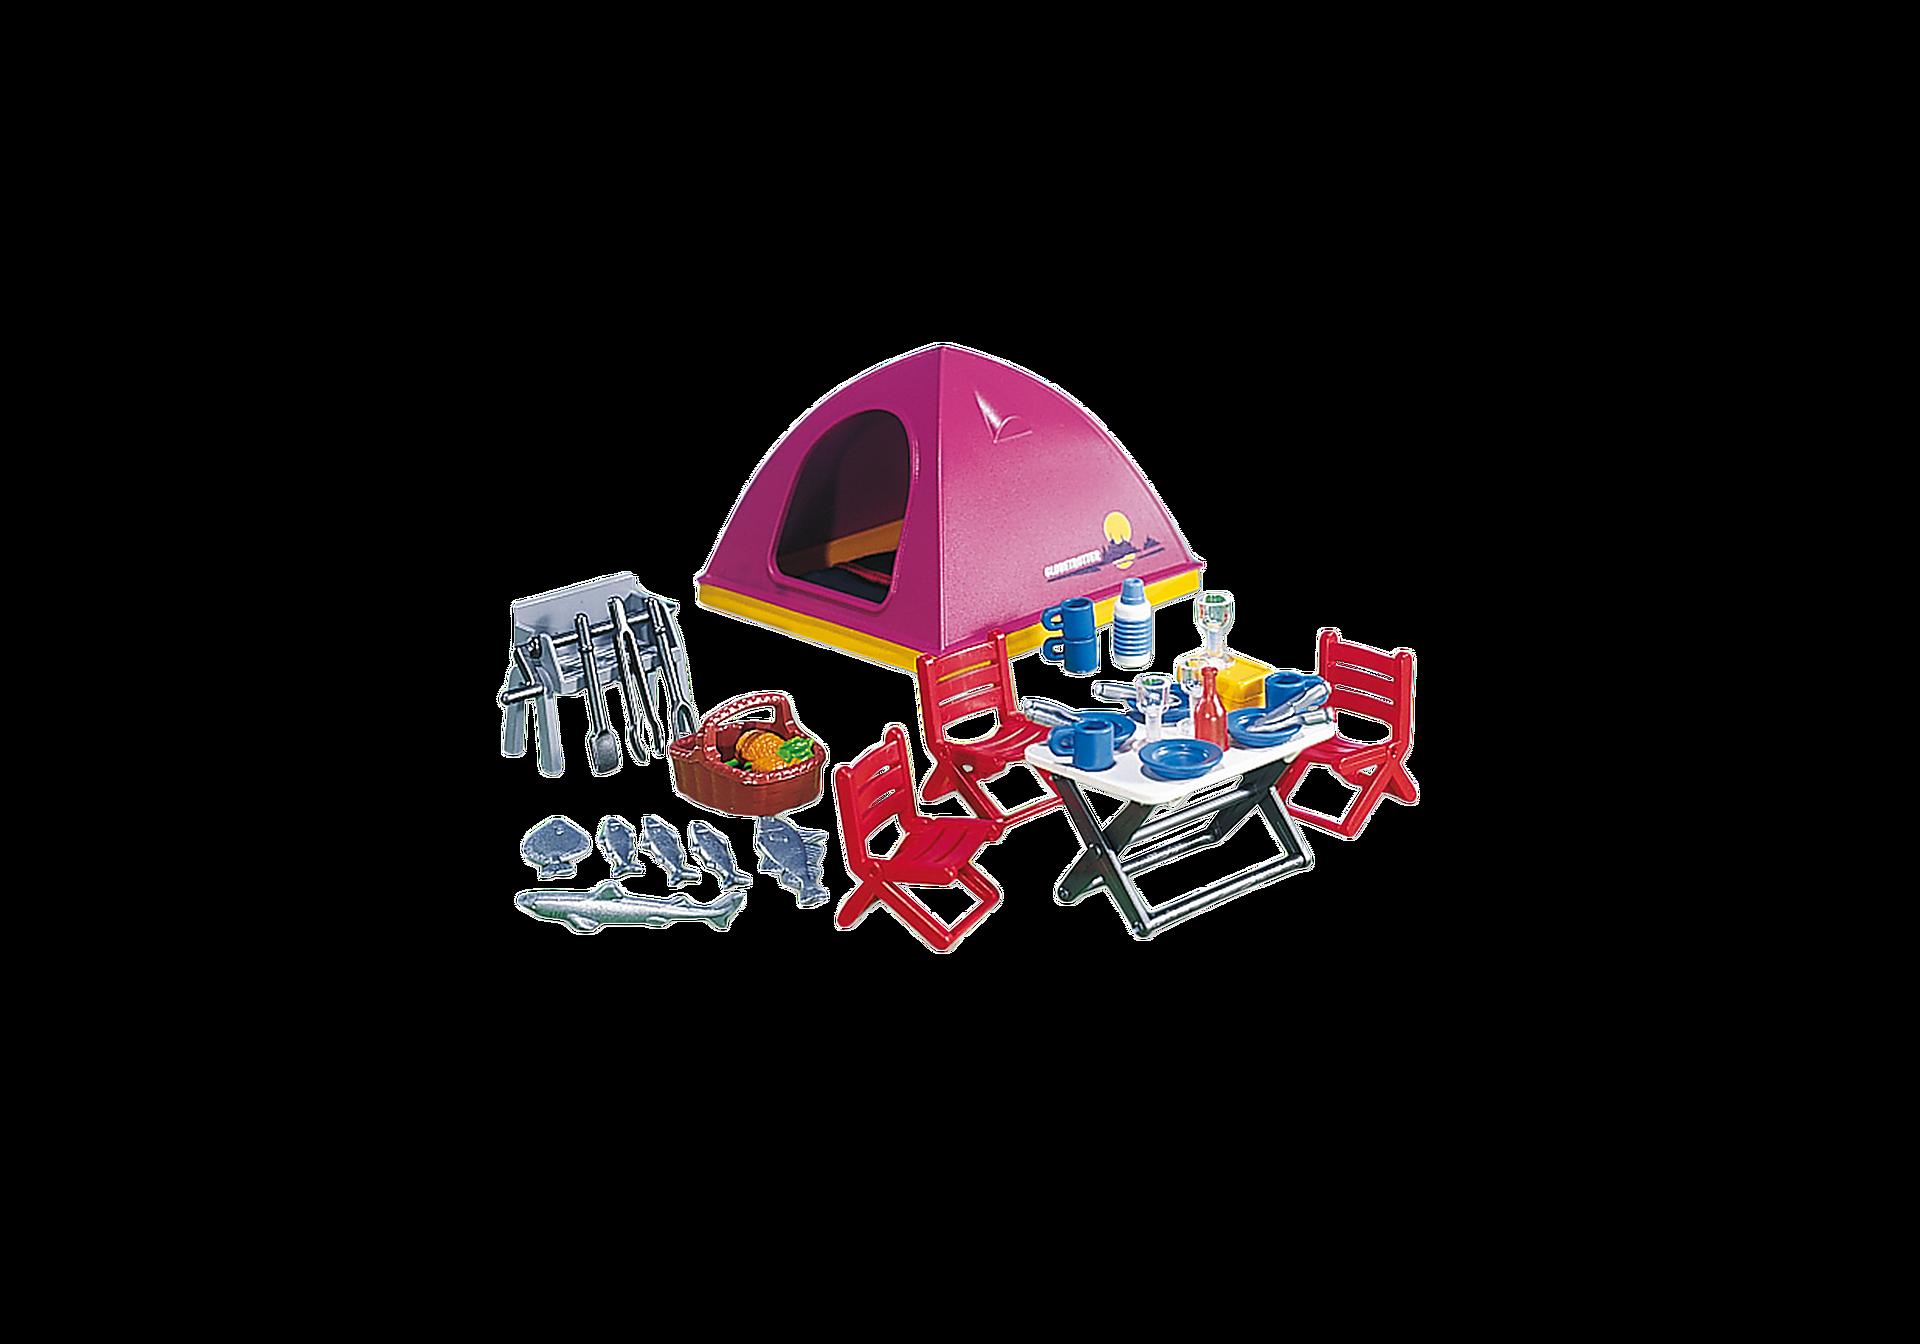 http://media.playmobil.com/i/playmobil/7260_product_detail/Campingset